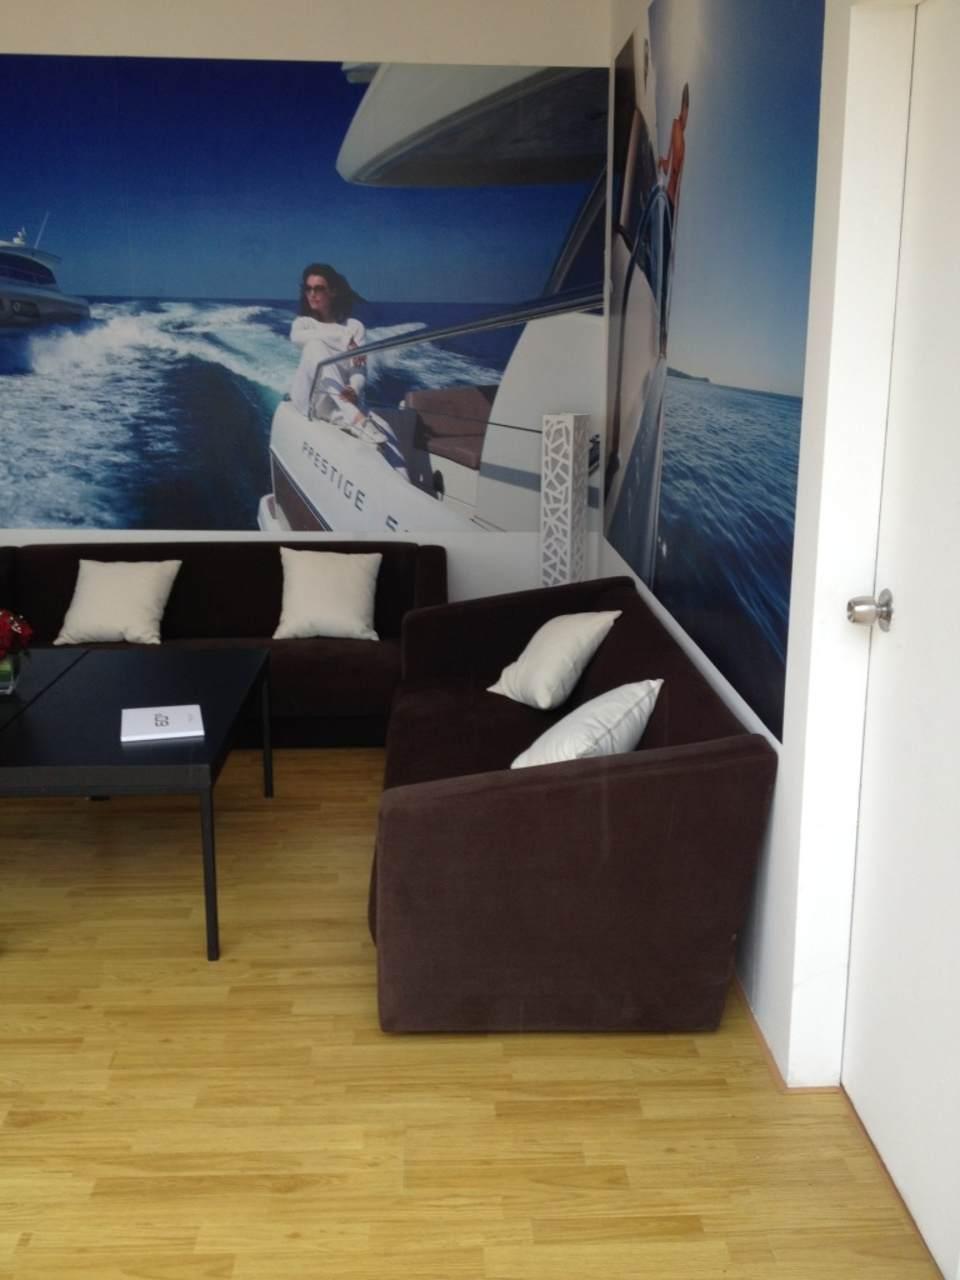 Jeanneau and Prestige in Hainan Rendez-vous boatshow 5